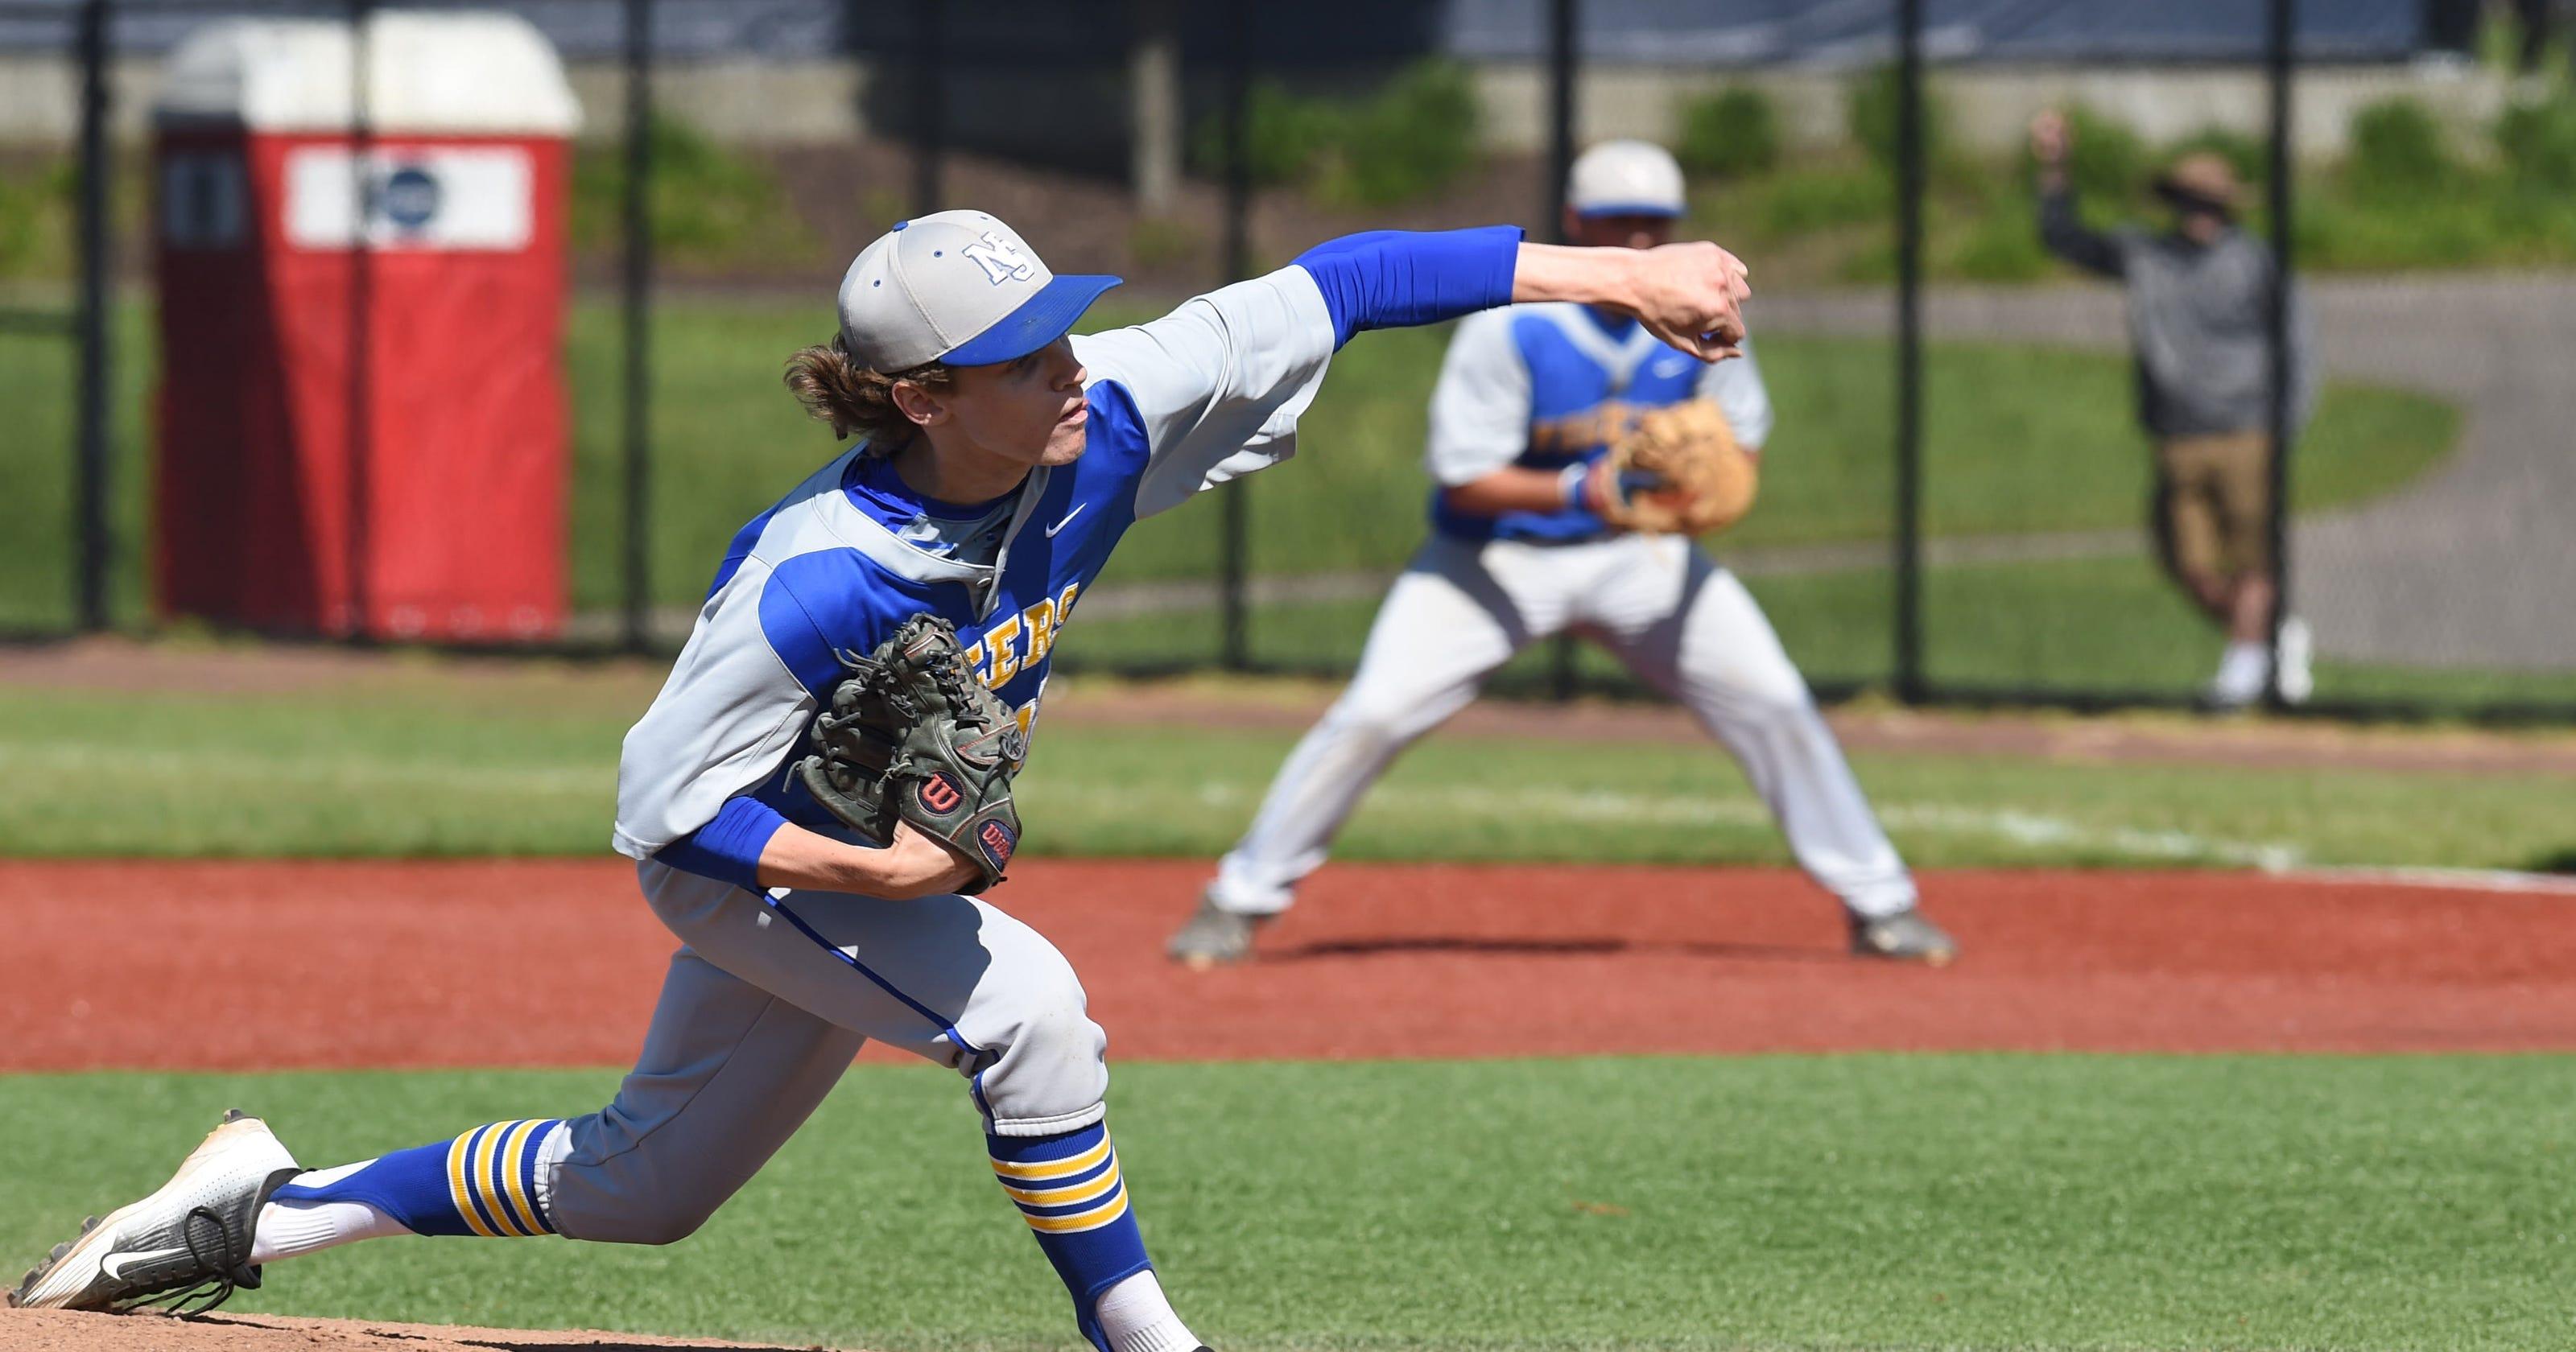 Baseball: The 2017 NYSSWA All-State selections